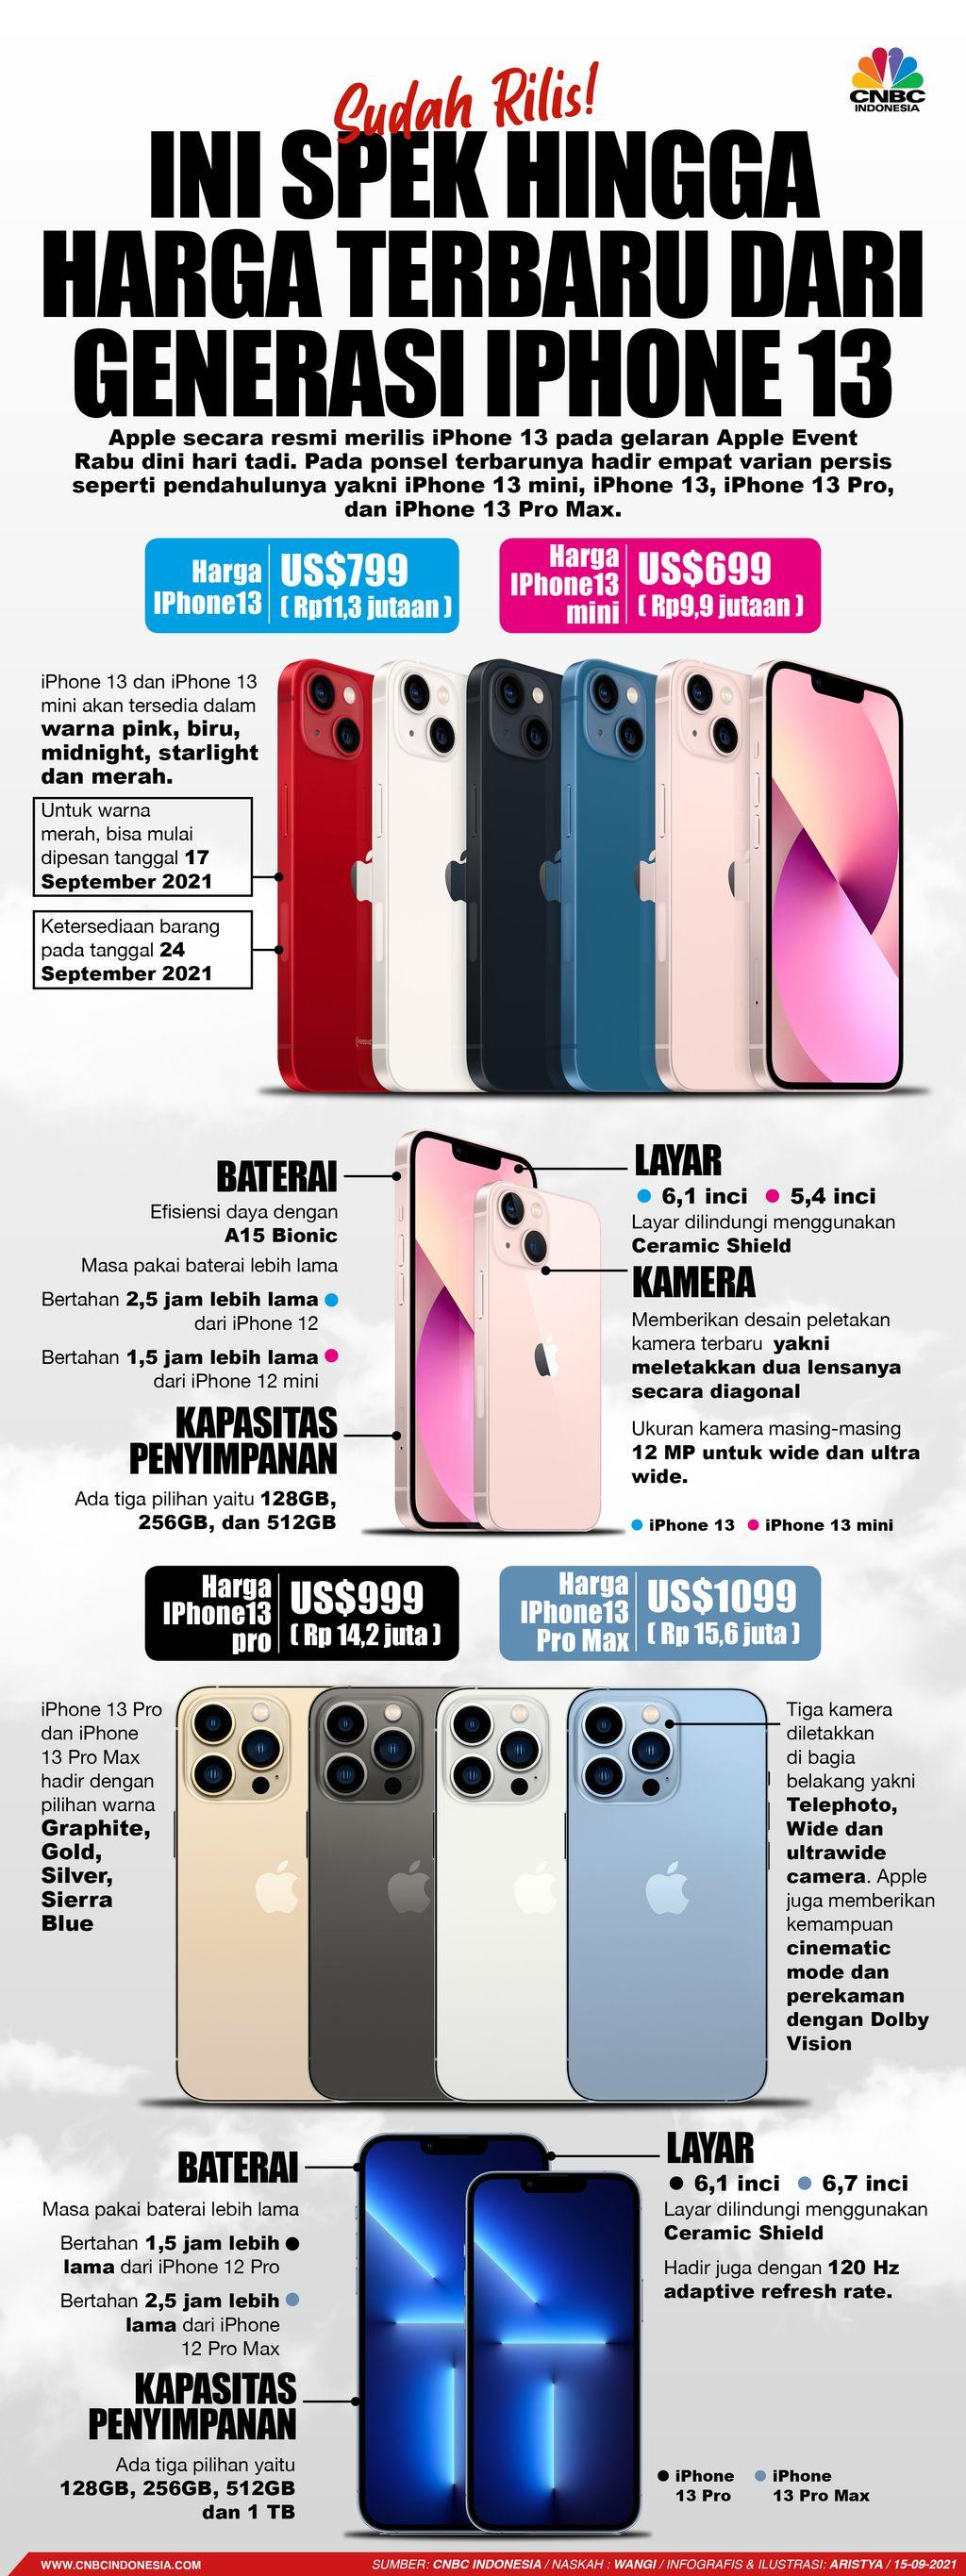 Infografis/ Sudah Rilis! Ini Spek hingga Harga terbaru dari Generasi Iphone 13/Aristya Rahadian